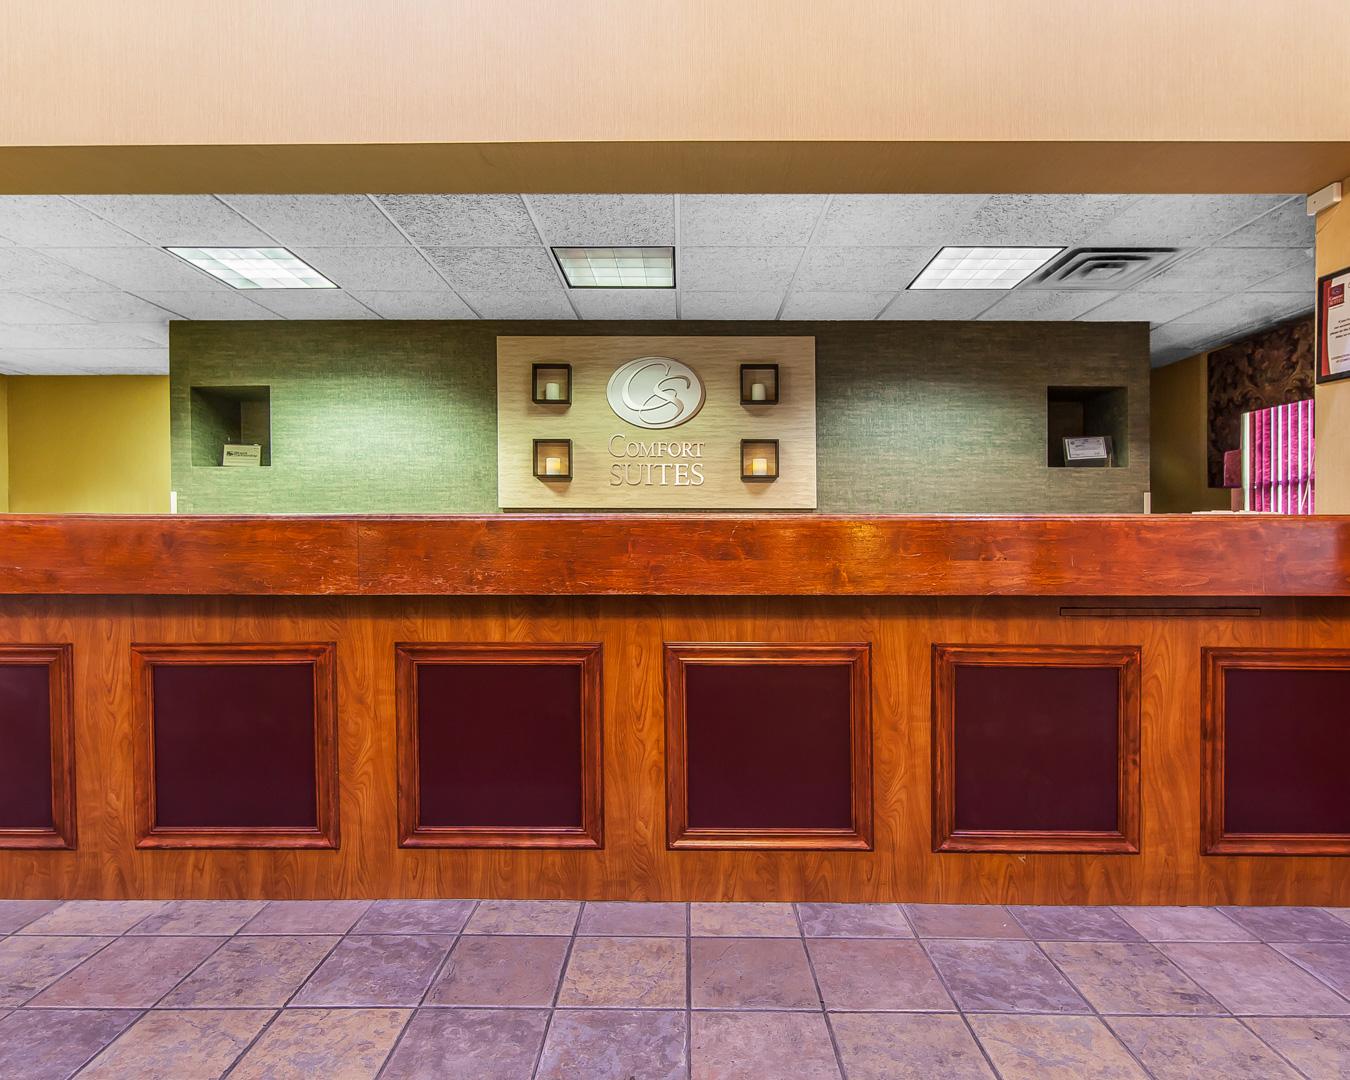 Comfort Suites Airport image 1